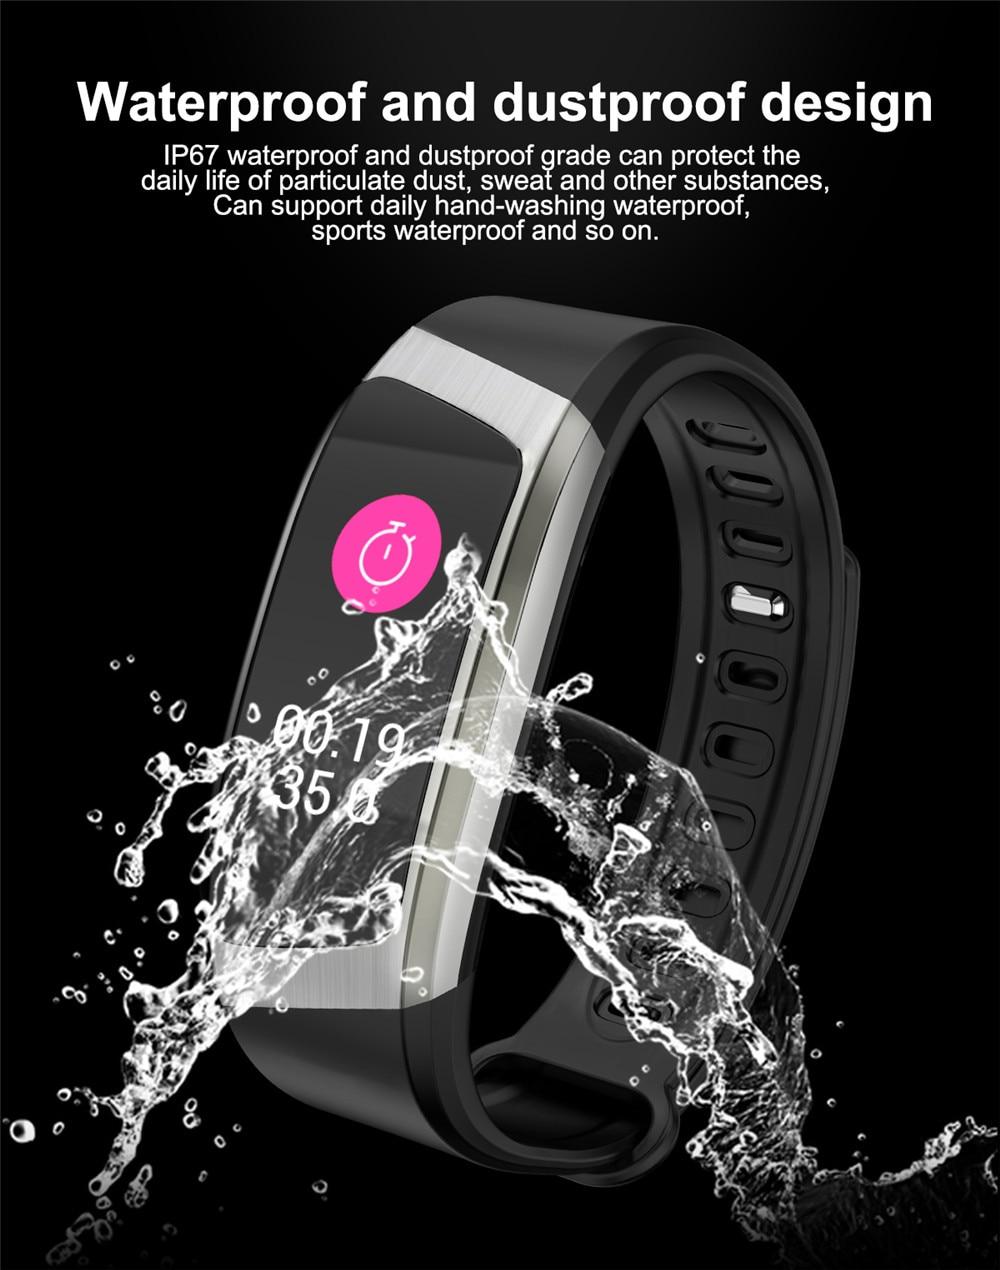 HTB1SIHvKXmWBuNjSspdq6zugXXaL Greentiger E18 Smart Bracelet Blood Pressure Heart Rate Monitor Fitness Tracker smart watch IP67 Waterproof camera Sports Band